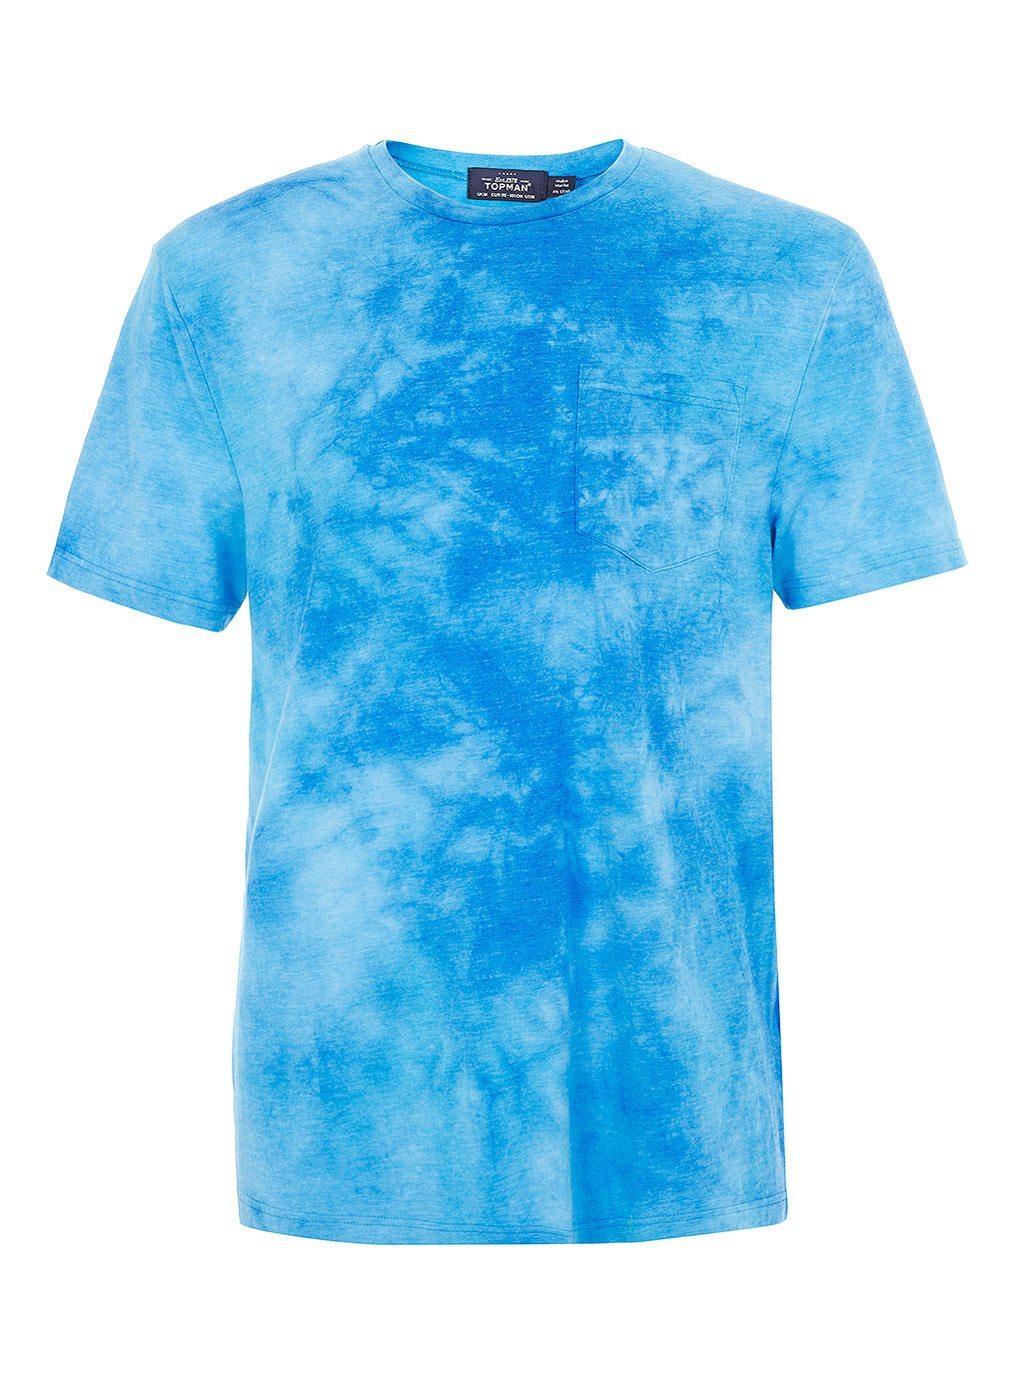 camiseta-estampada-topman-rebajas-verano-2013